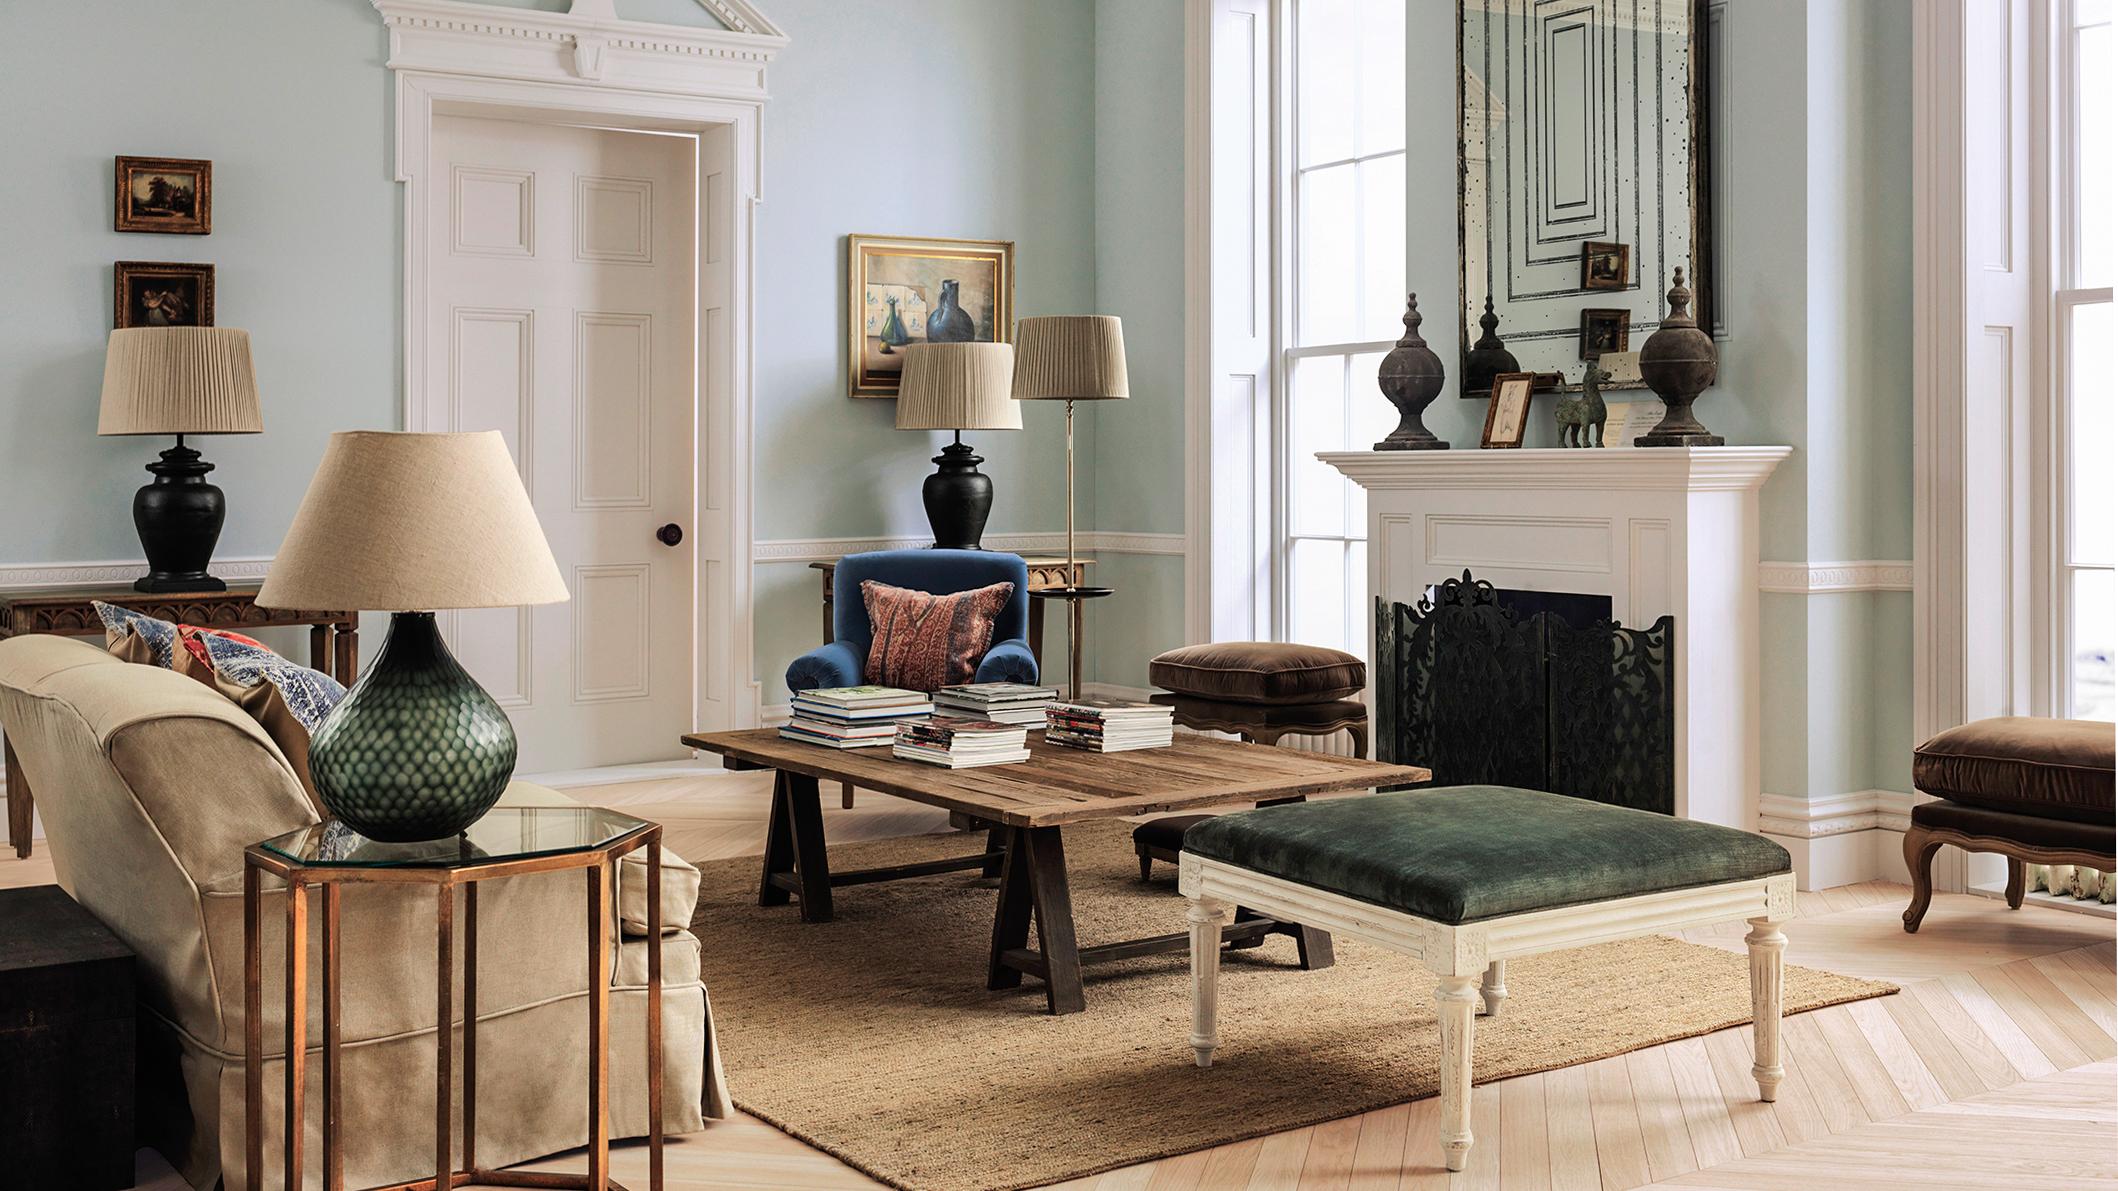 17 Elegant Living Room Ideas To Add, Elegant Living Room Ideas